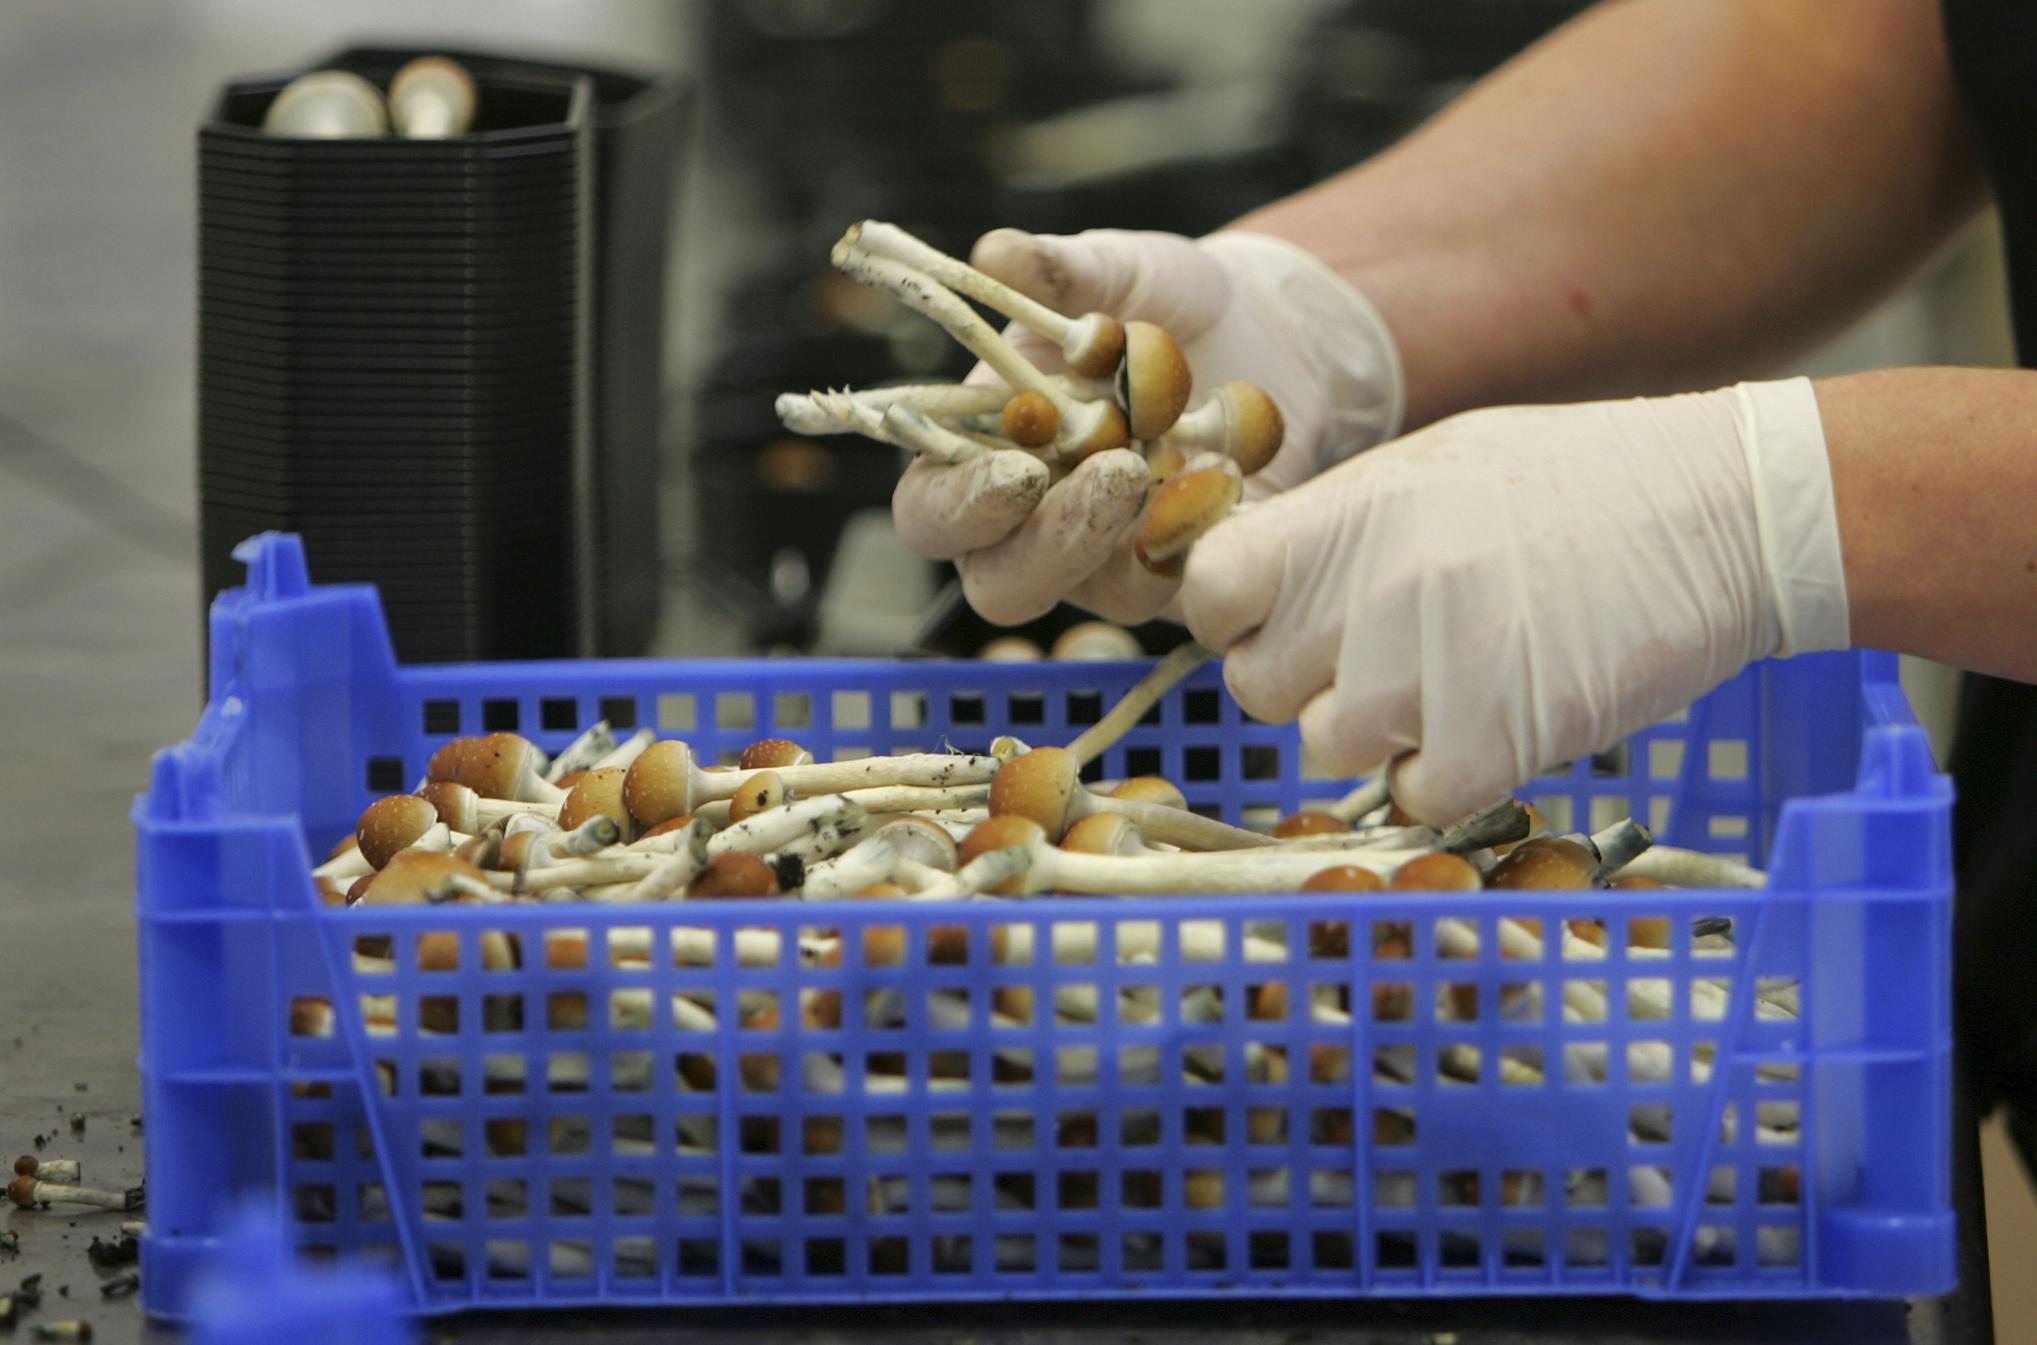 Magic mushrooms are one step closer to decriminalization in Denver and Oregon